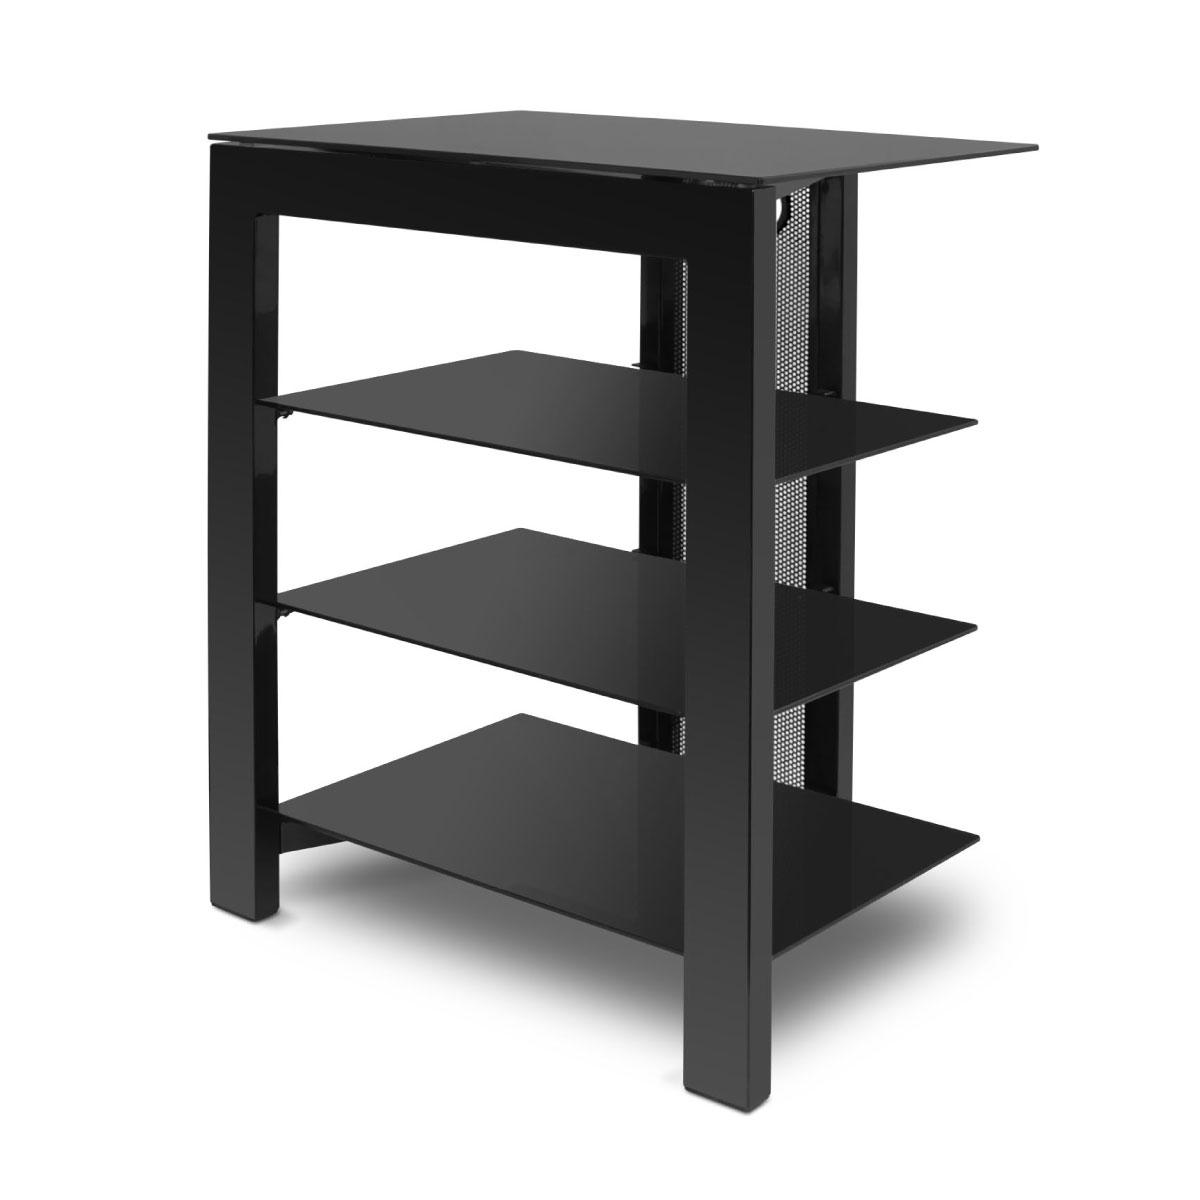 de conti arca xl noir meuble tv de conti sur. Black Bedroom Furniture Sets. Home Design Ideas